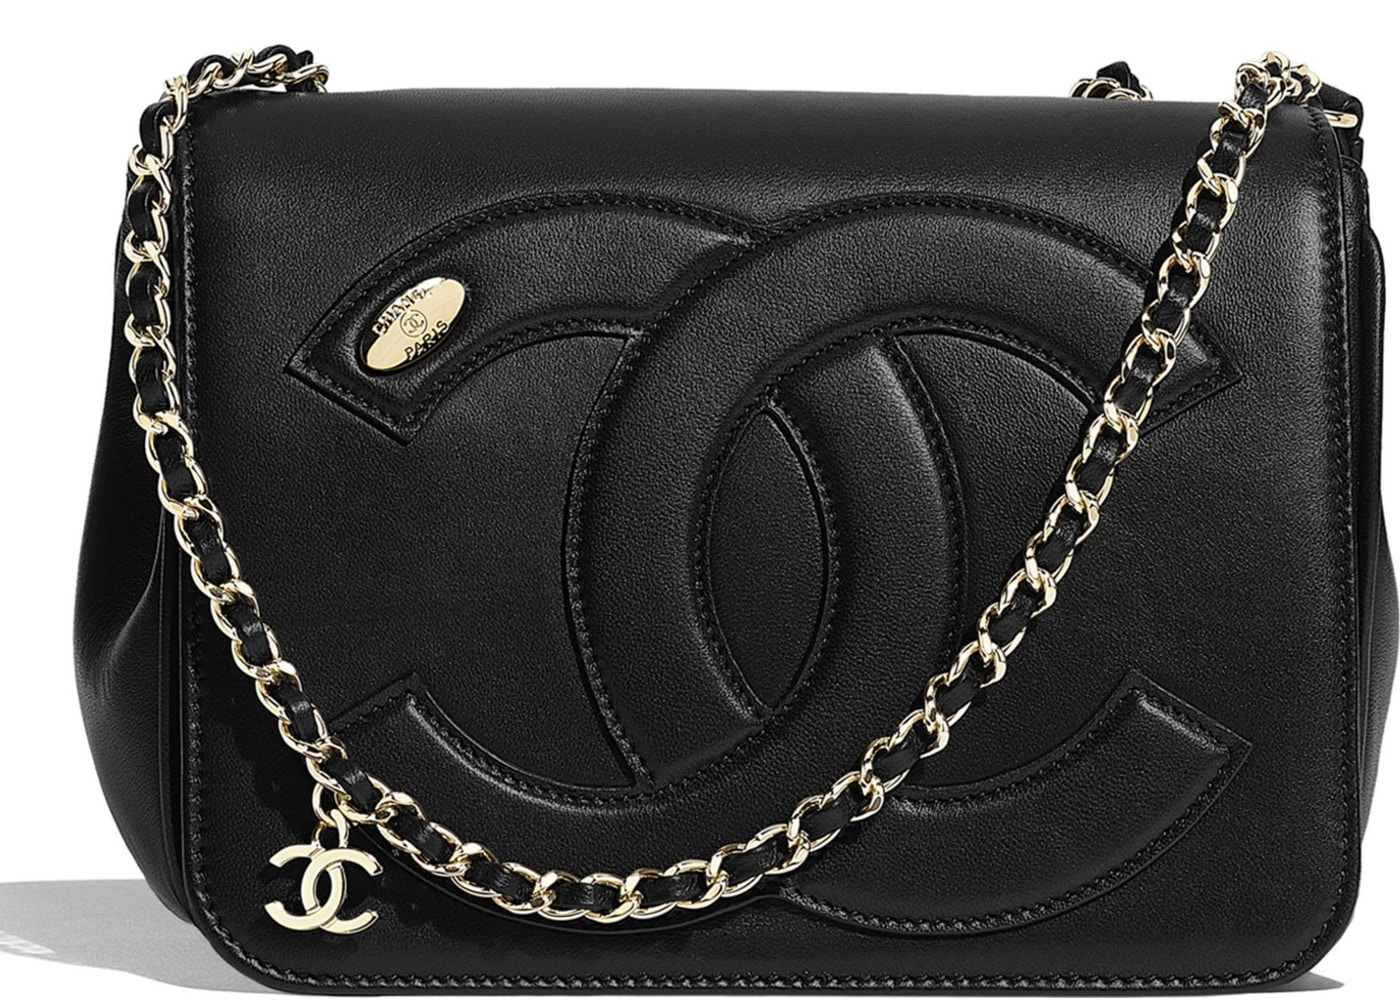 1ab693ef06e675 Chanel Flap Bag Lambskin Gold-tone Black. Lambskin Gold-tone Black